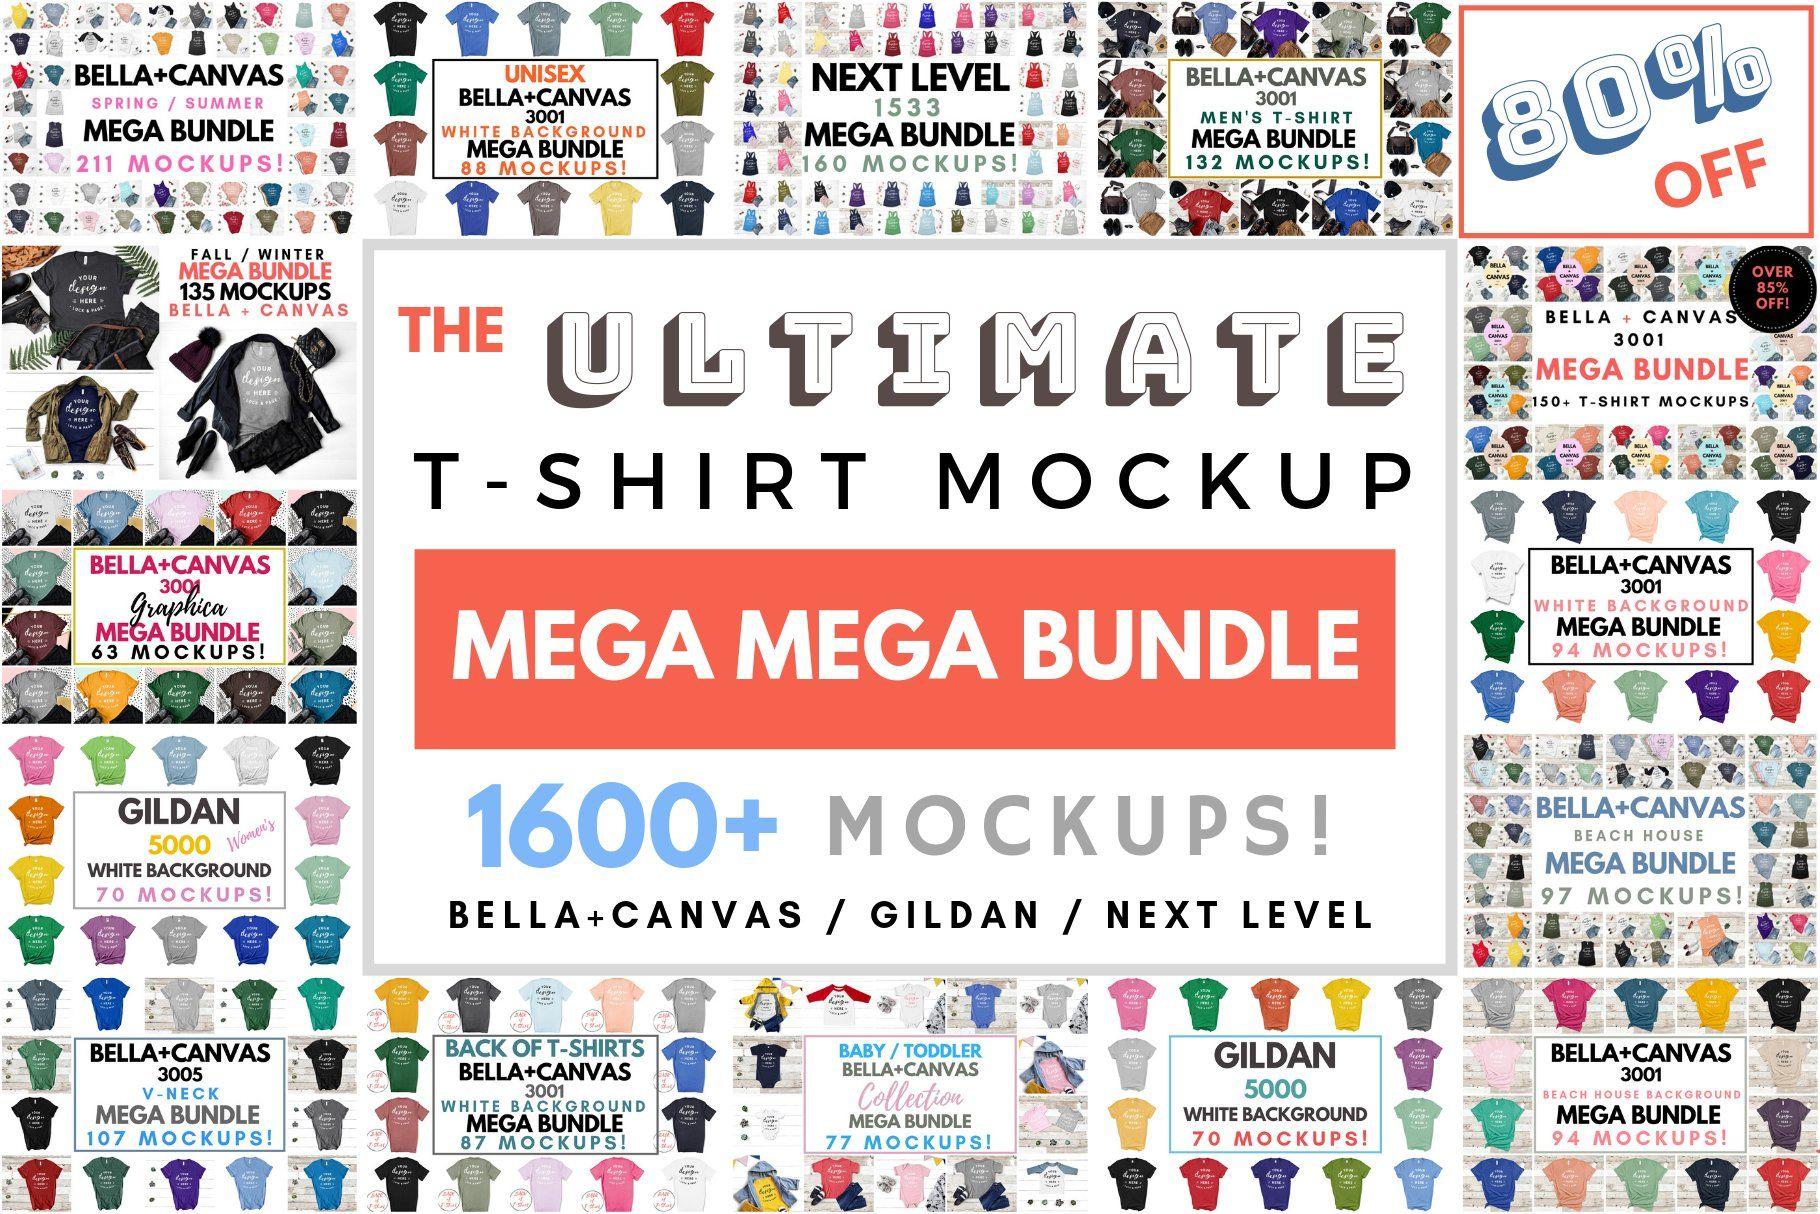 5000+ custom shapes for photoshop download free how to download & Ultimate T Shirt Mockup Mega Bundle Tshirt Mockup Design Mockup Free Mockup